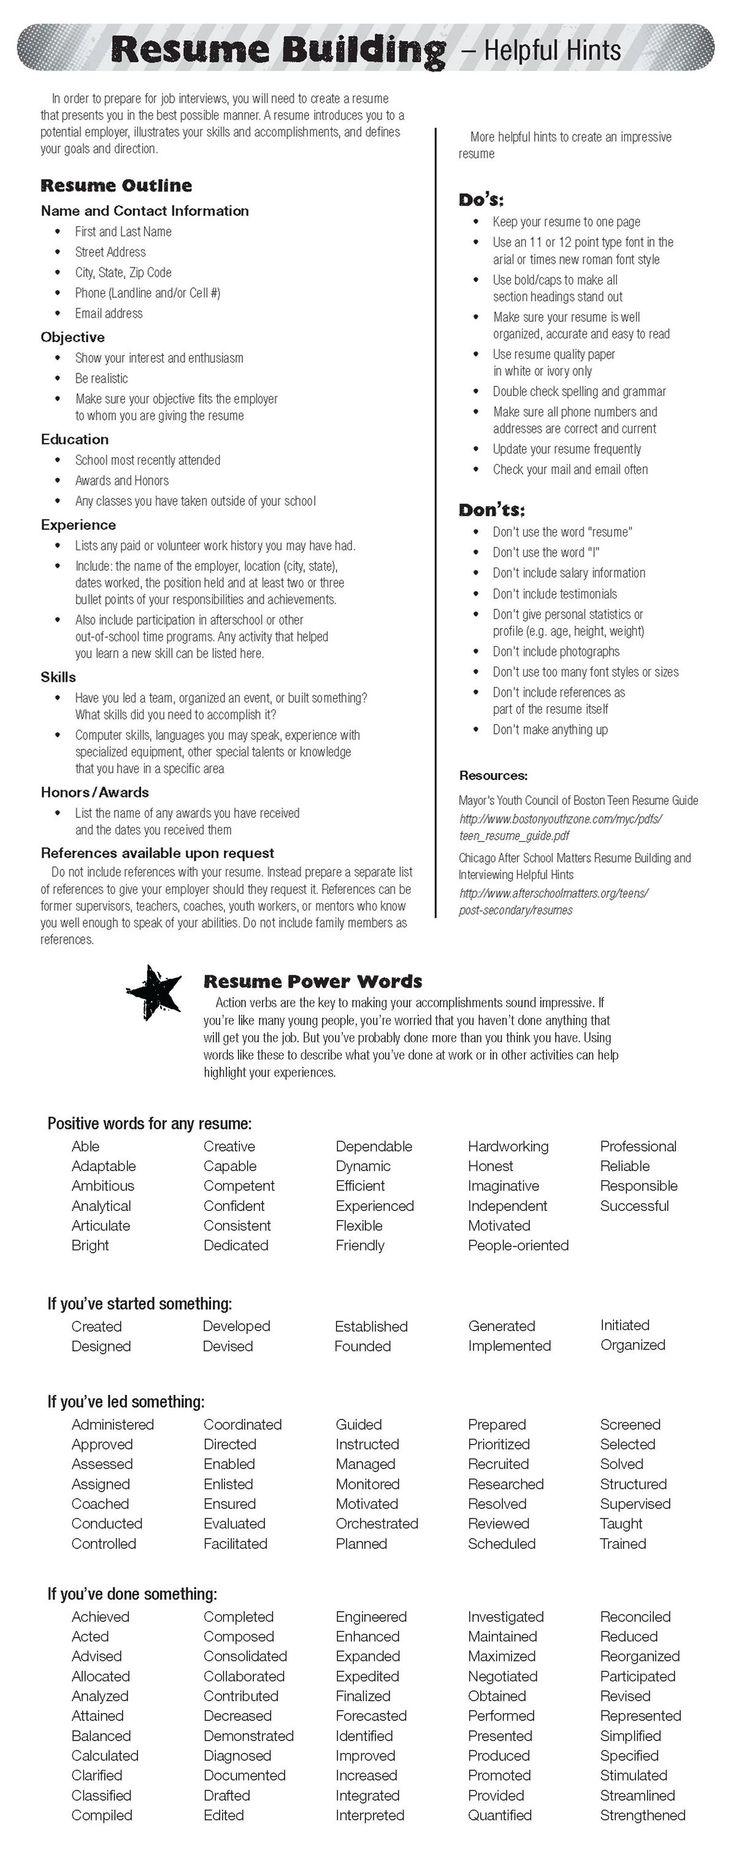 52 best Resume Ideas images on Pinterest | Resume ideas, Resume ...